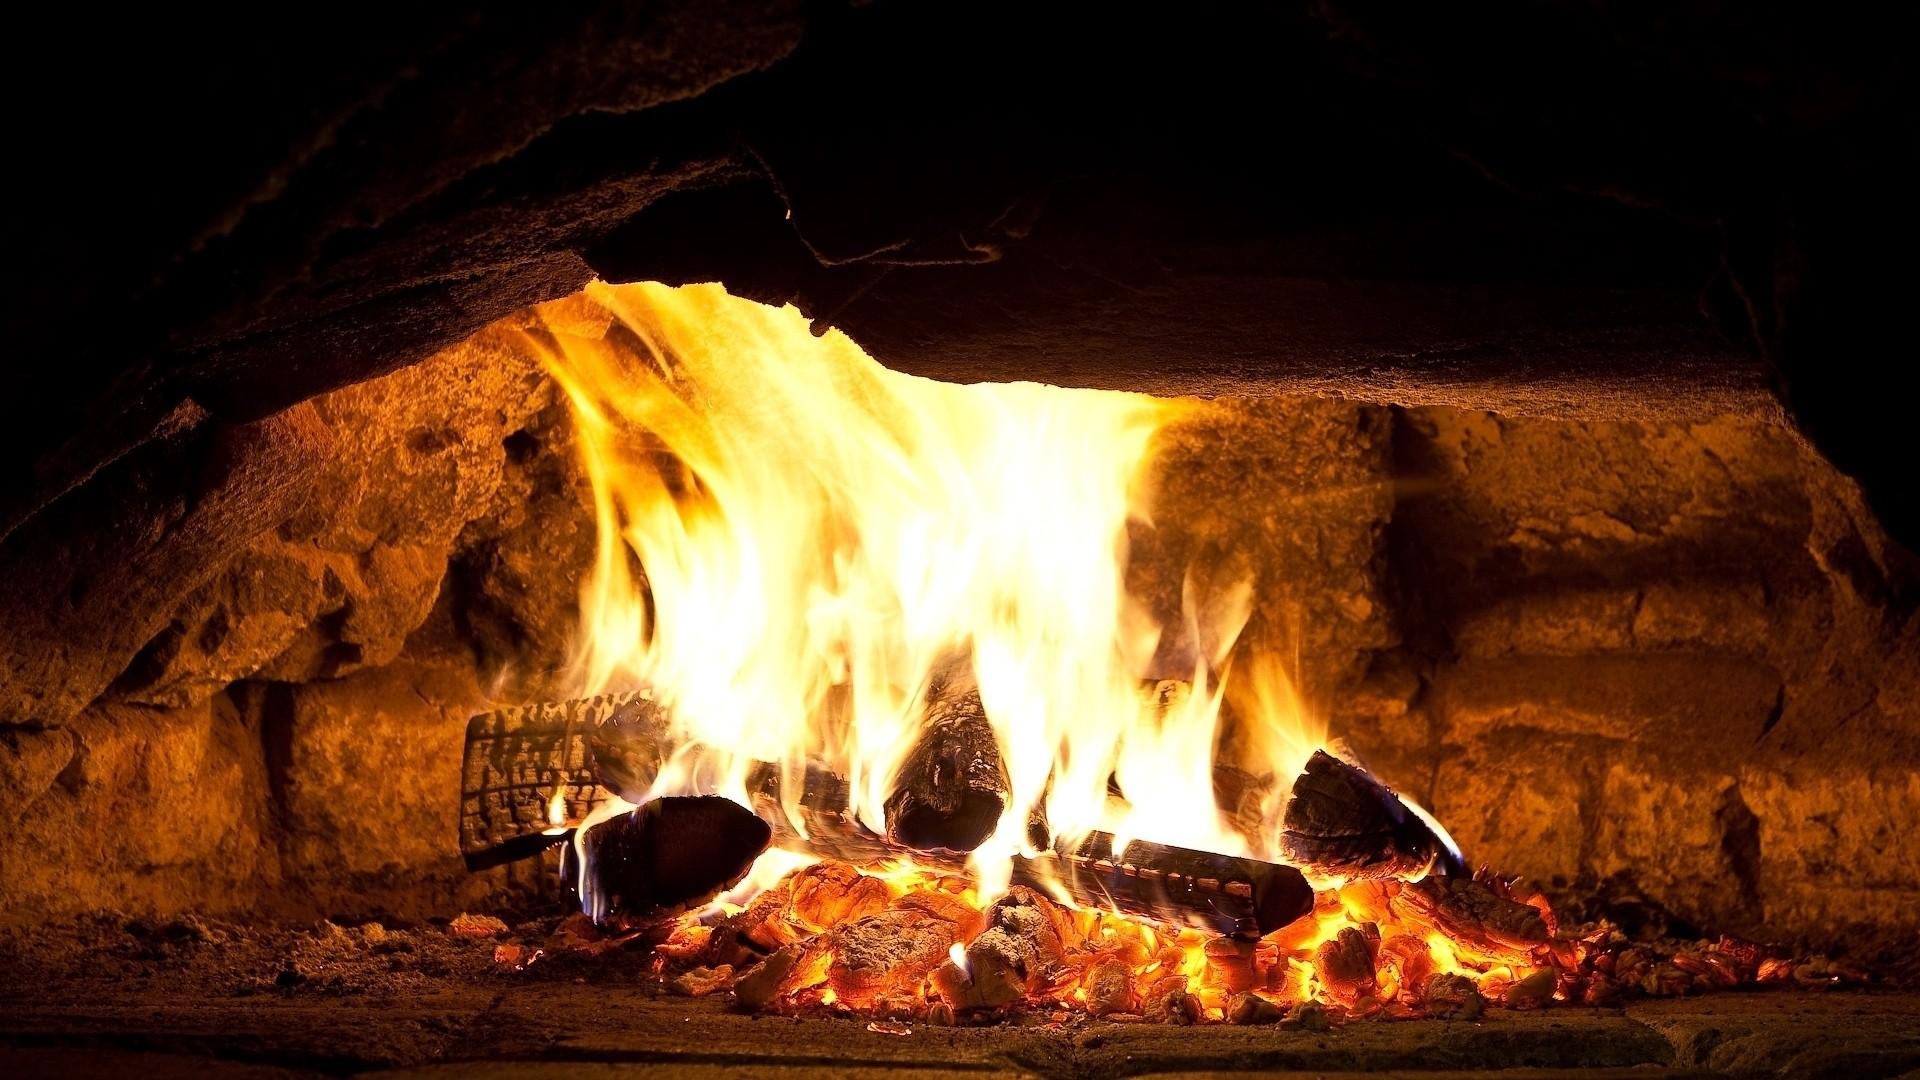 Fireplace Free Wallpaper